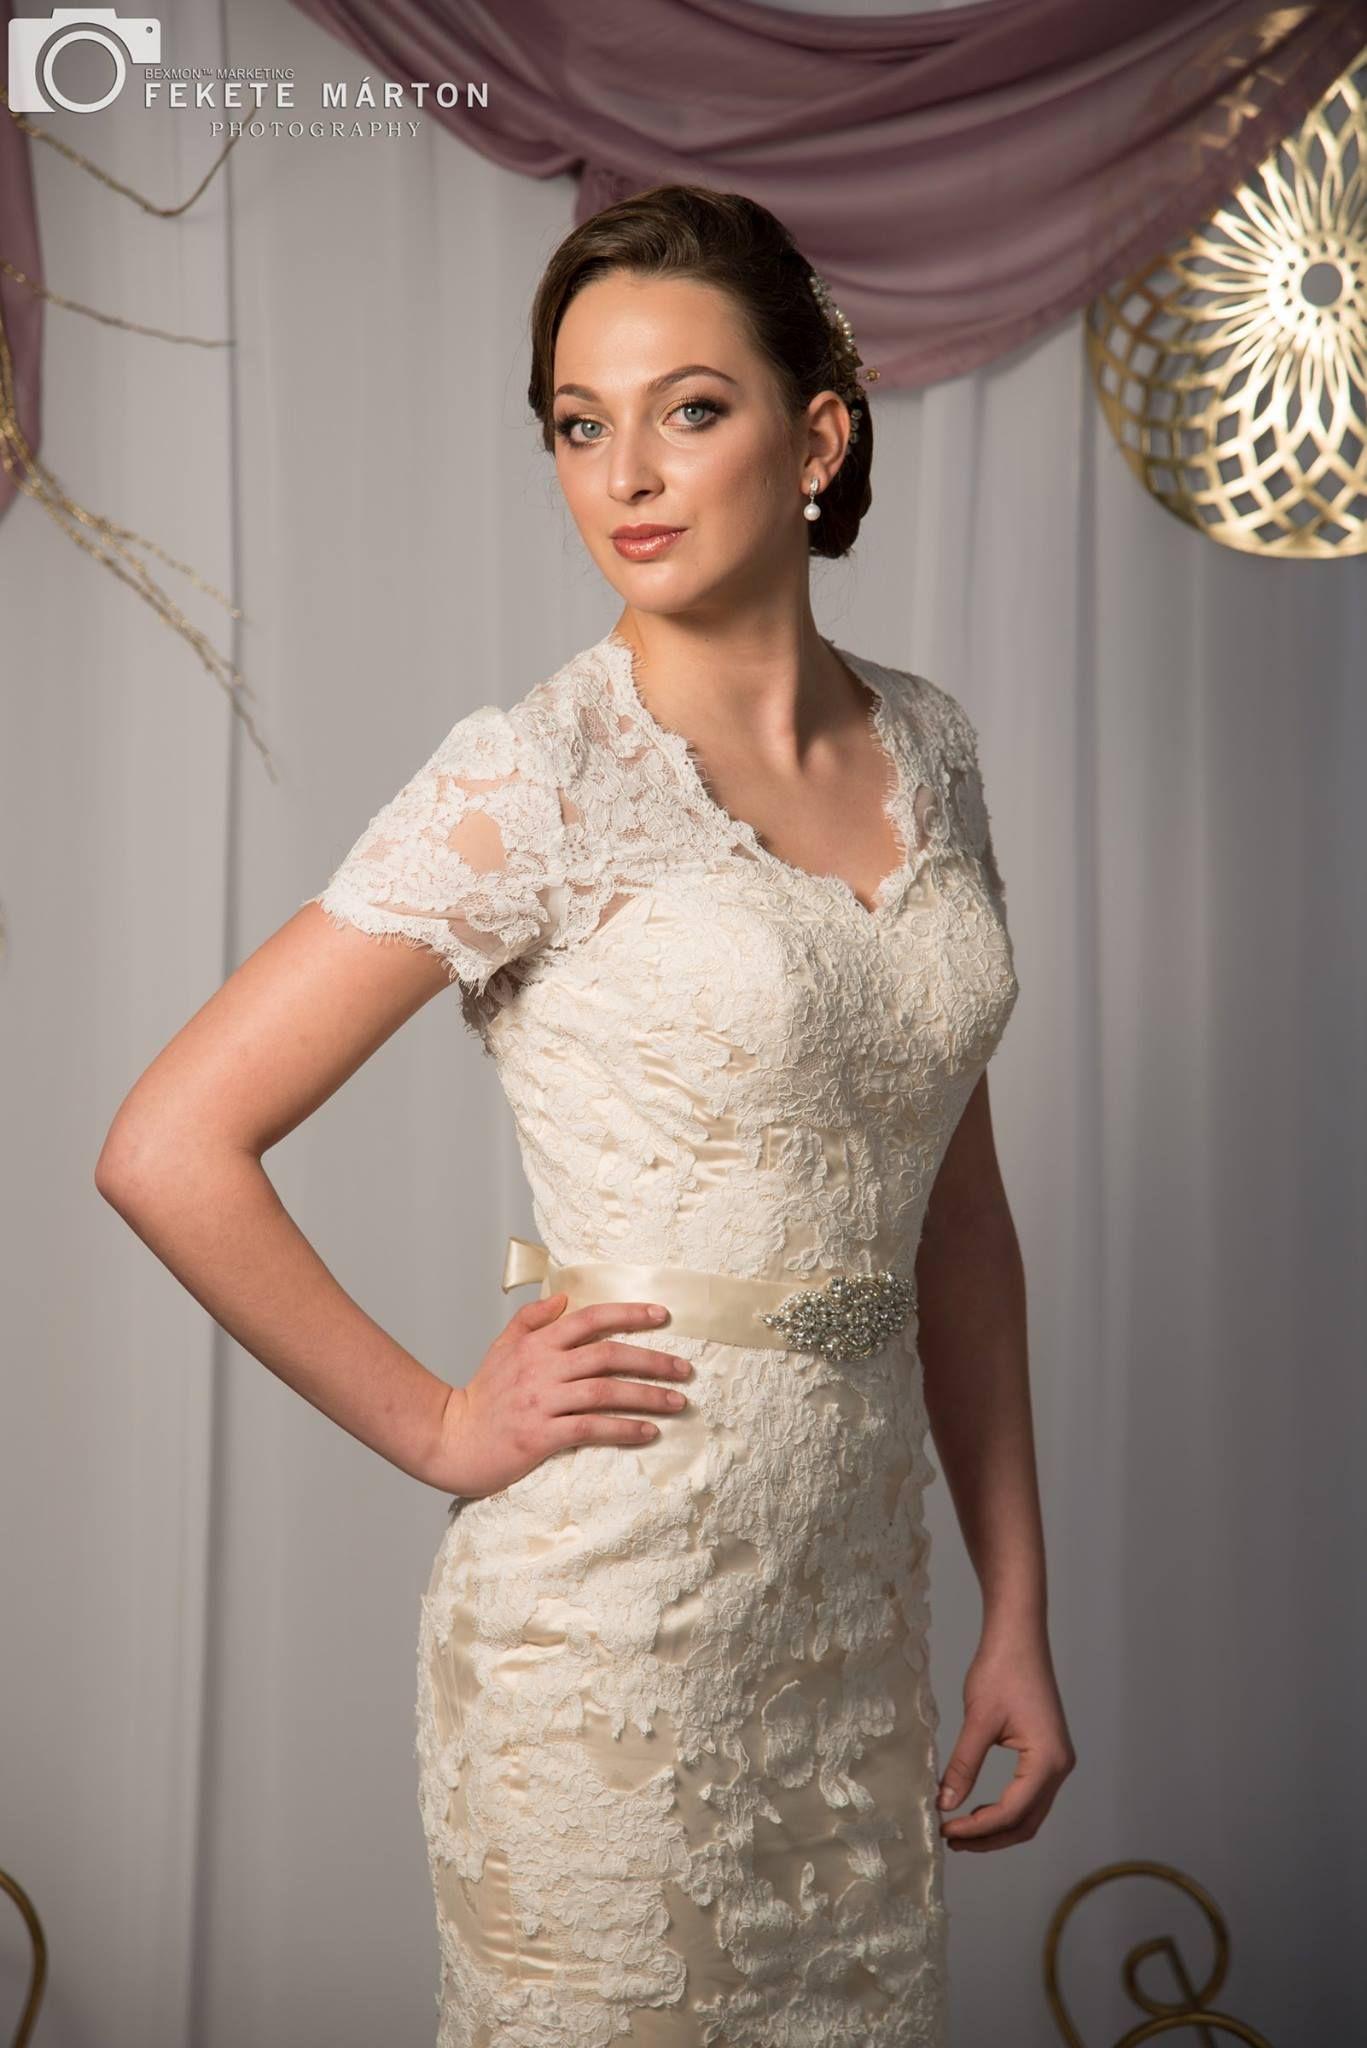 Vintage style, ivory with cream underlay wedding dress